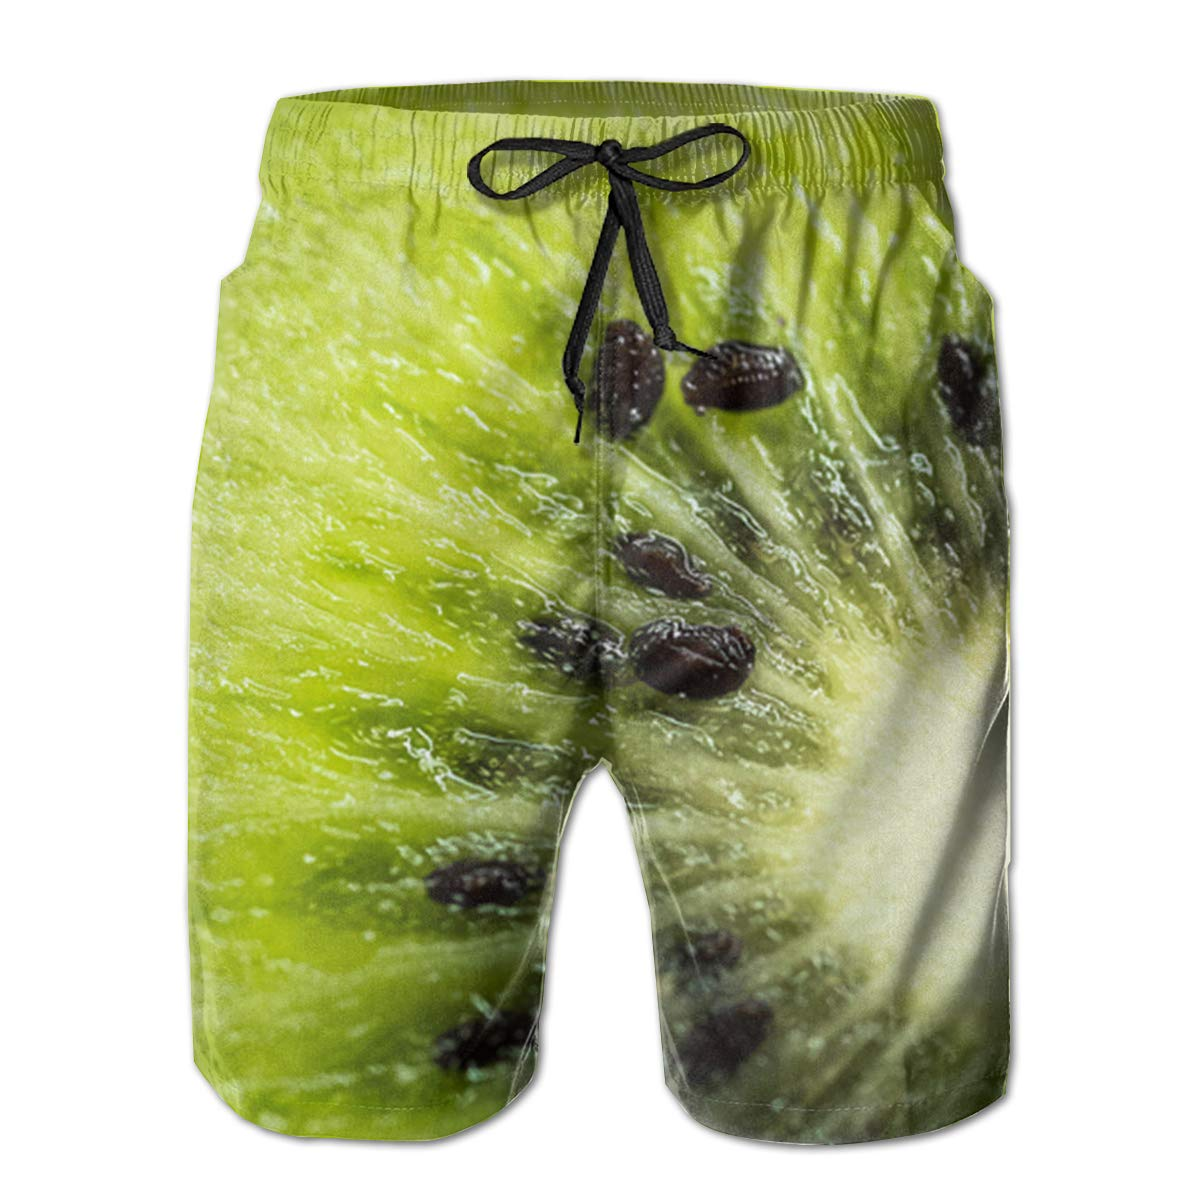 EYFlife Fruit Kiwi Men/â/€s Beach Board Shorts Quick Dry Swim Truck Shorts